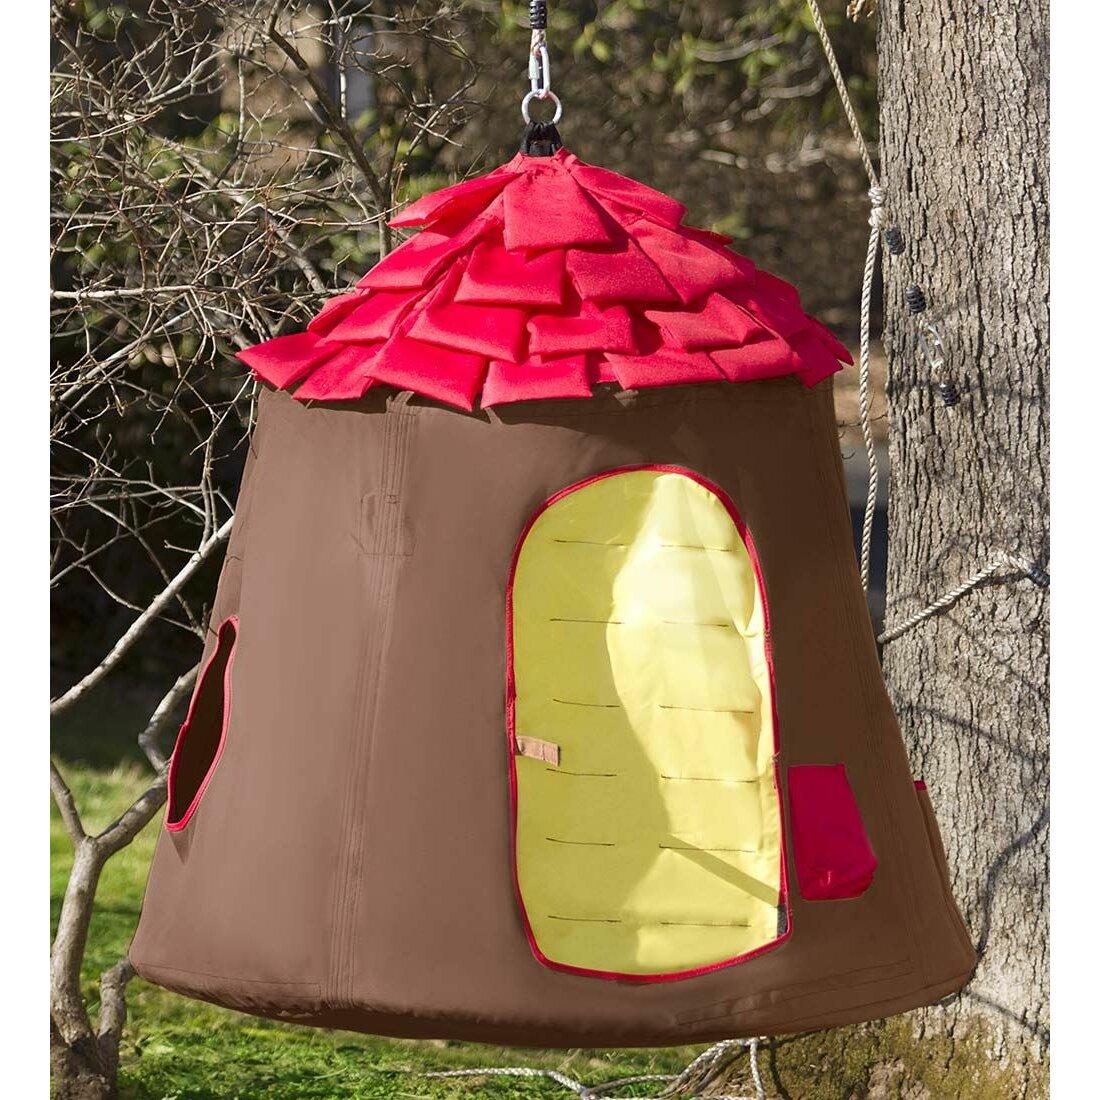 Magic cabin go hangout hugglepod tree fort wayfair for Magic cabin tree fort kit